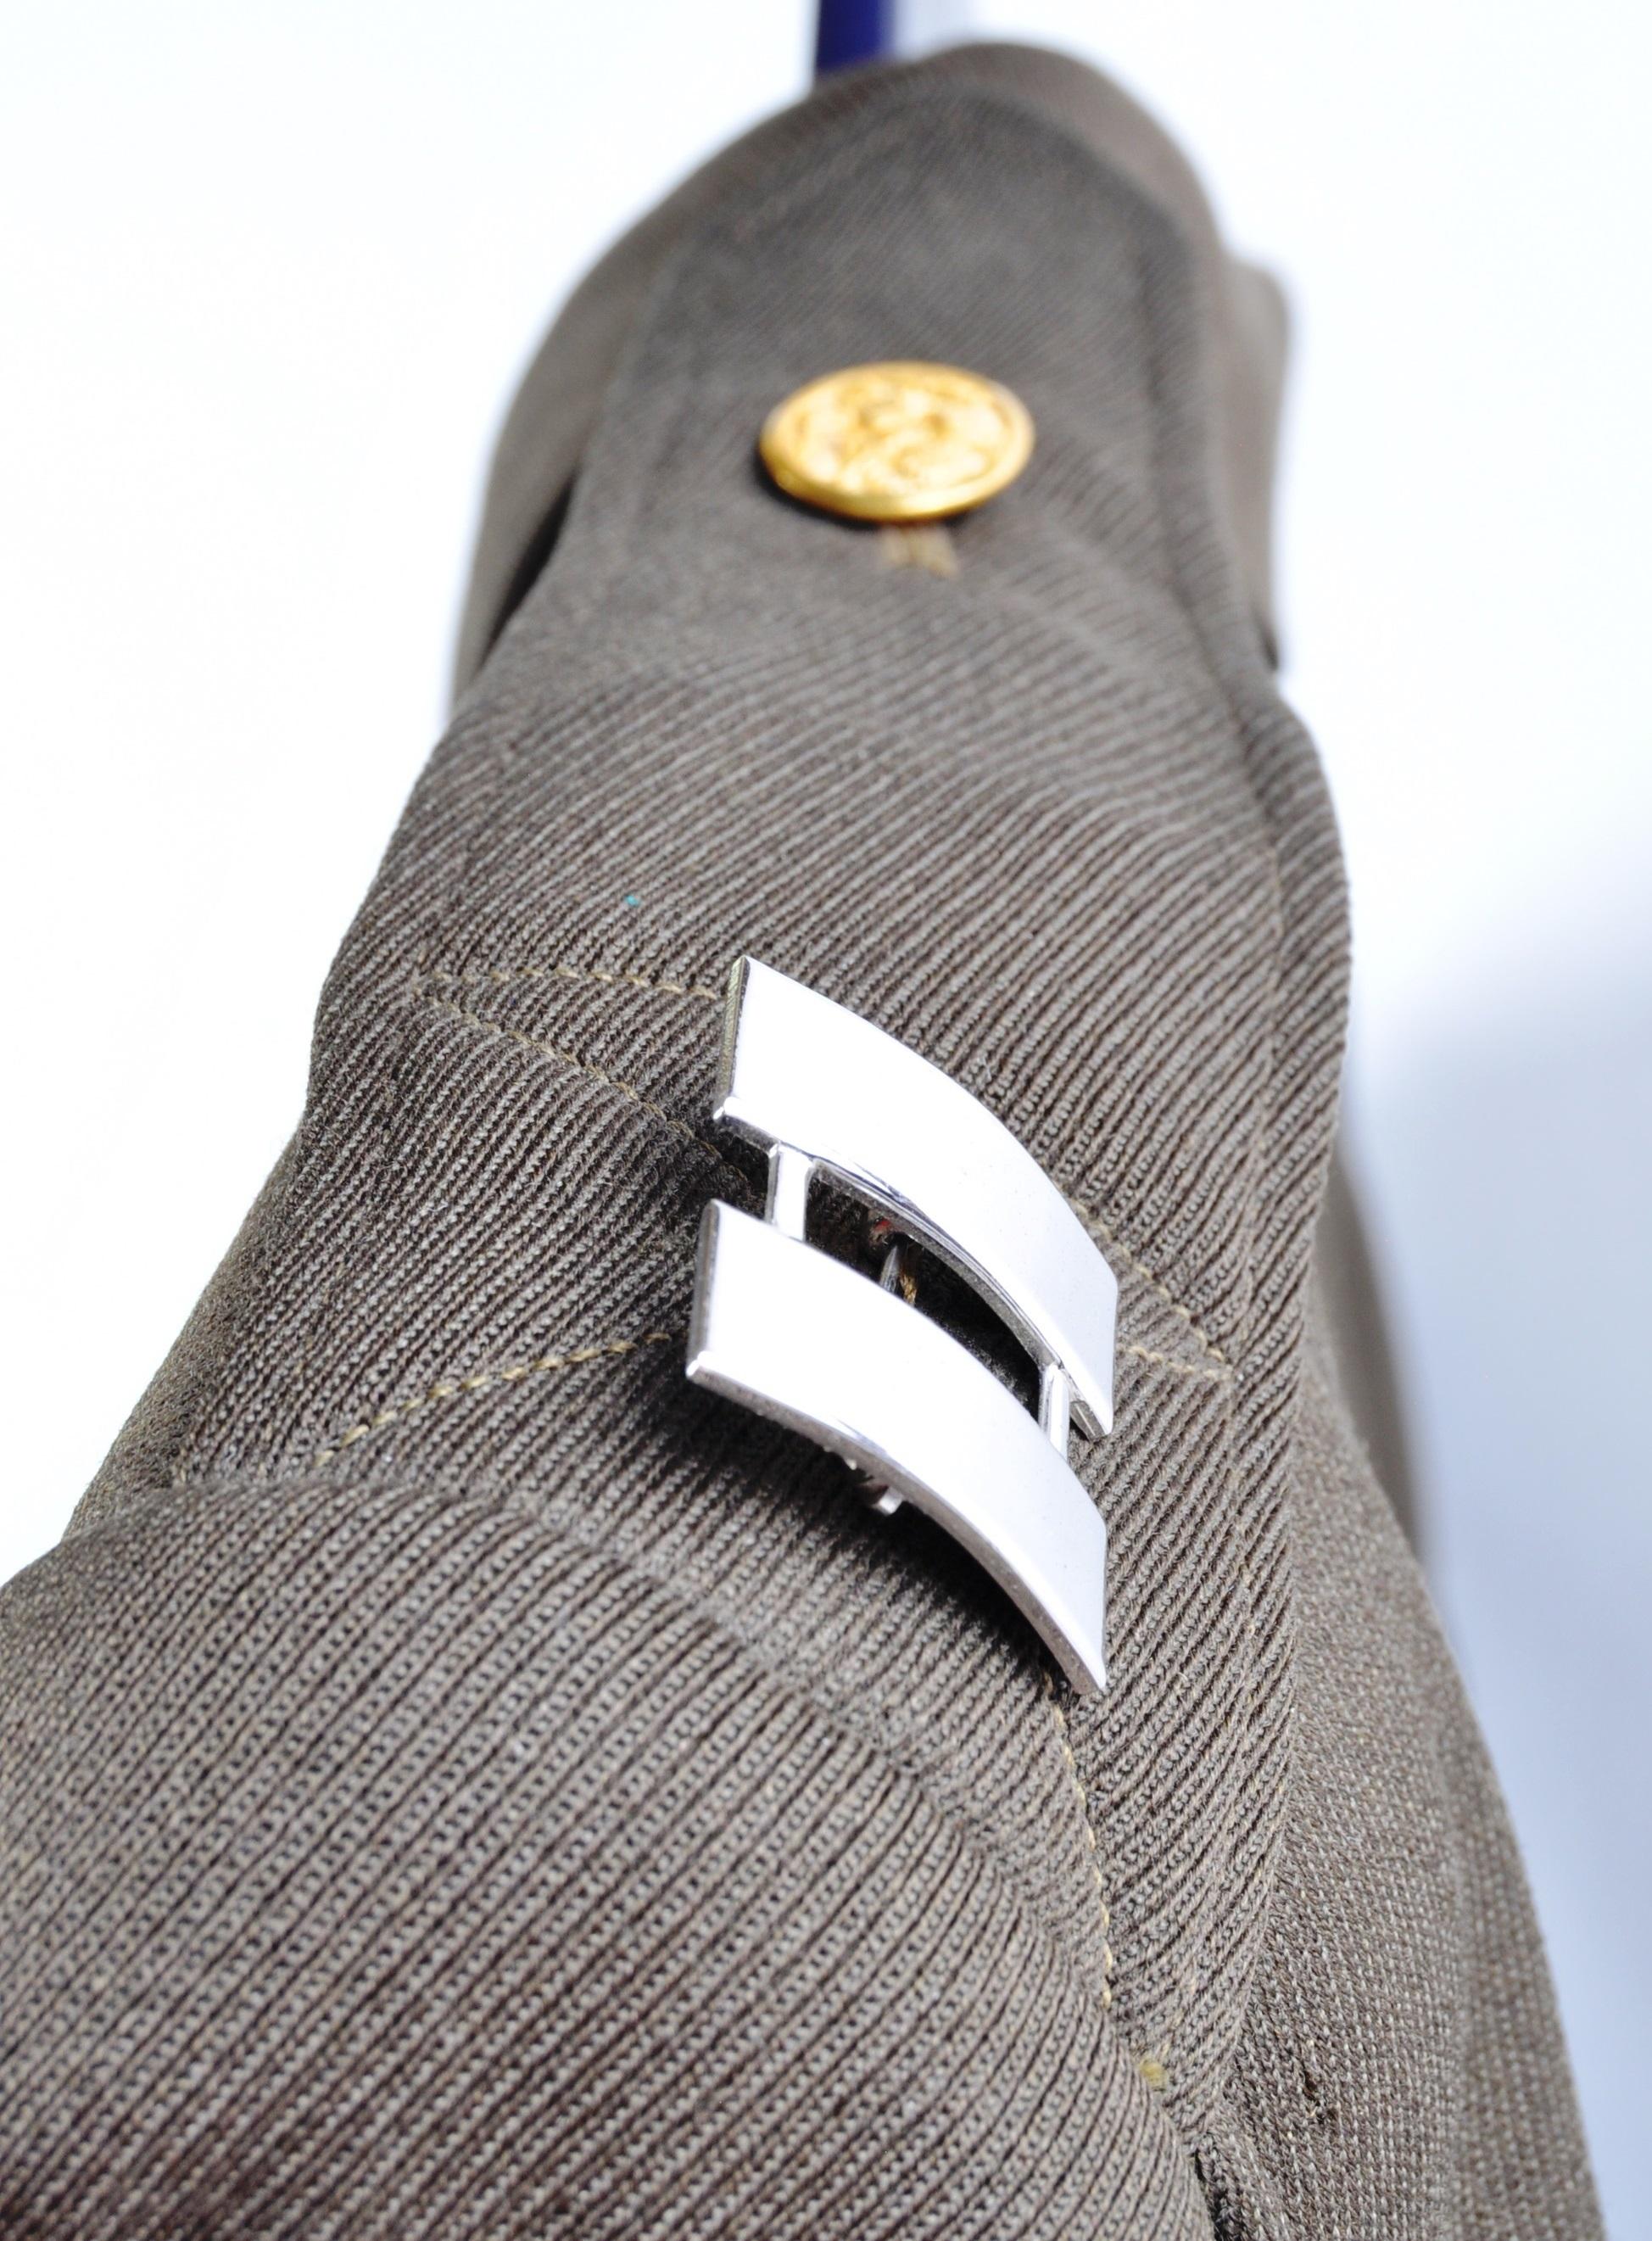 20TH CENTURY UNITED STATES ARMY CAPTAINS UNIFORM TUNIC - Image 3 of 10